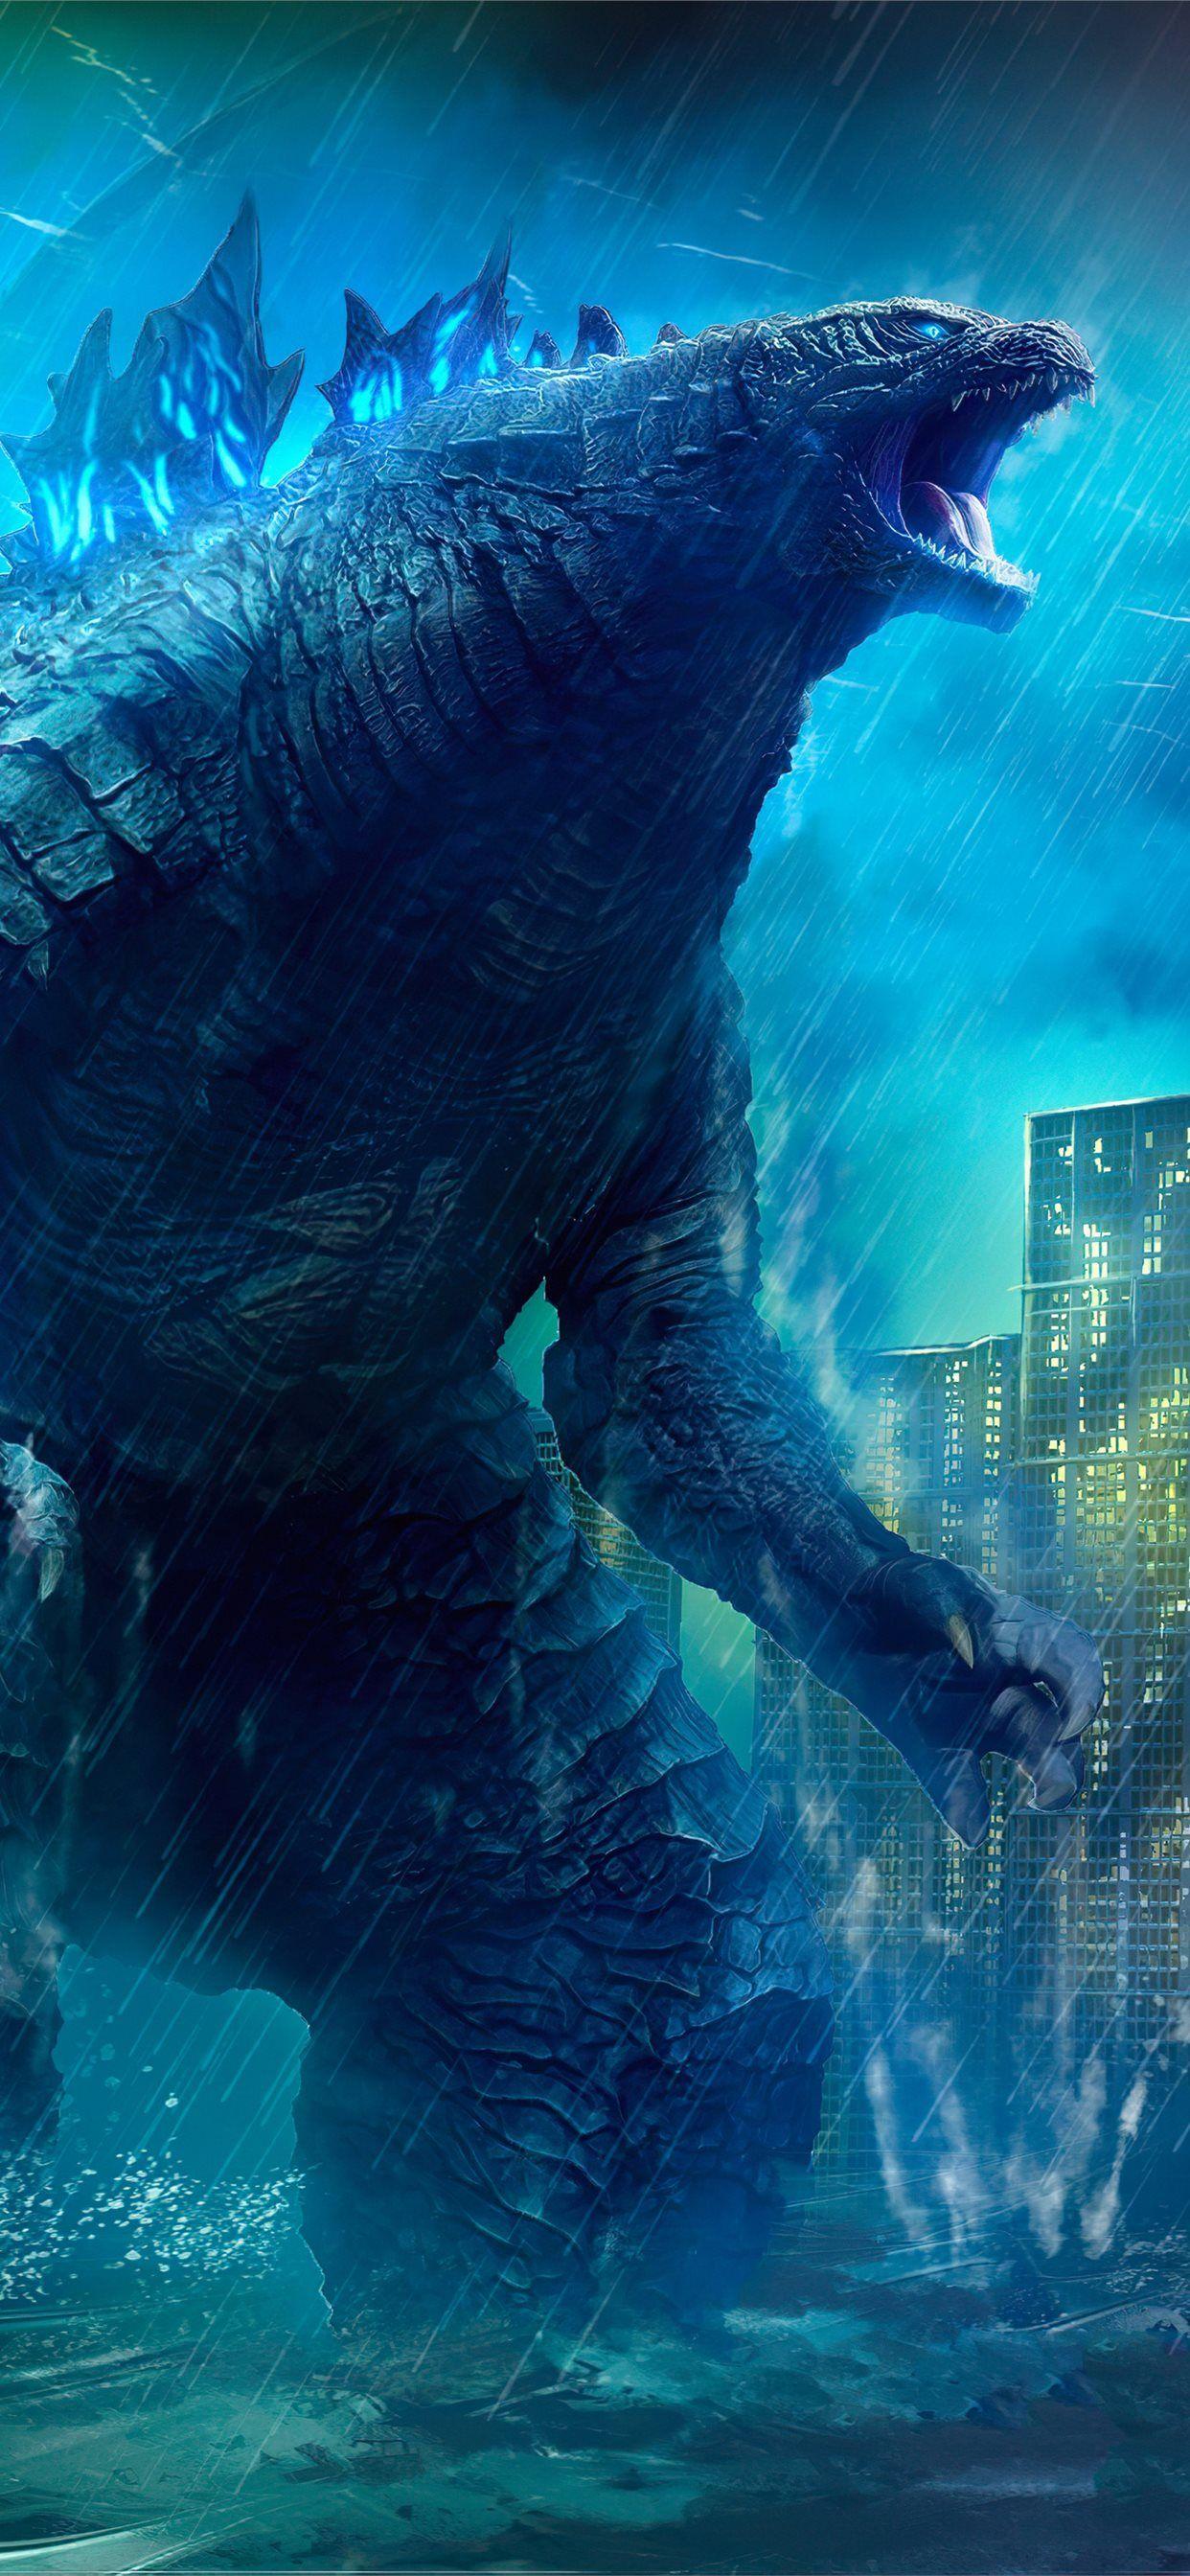 Electric Godzilla Wallpapers - Wallpaper Cave